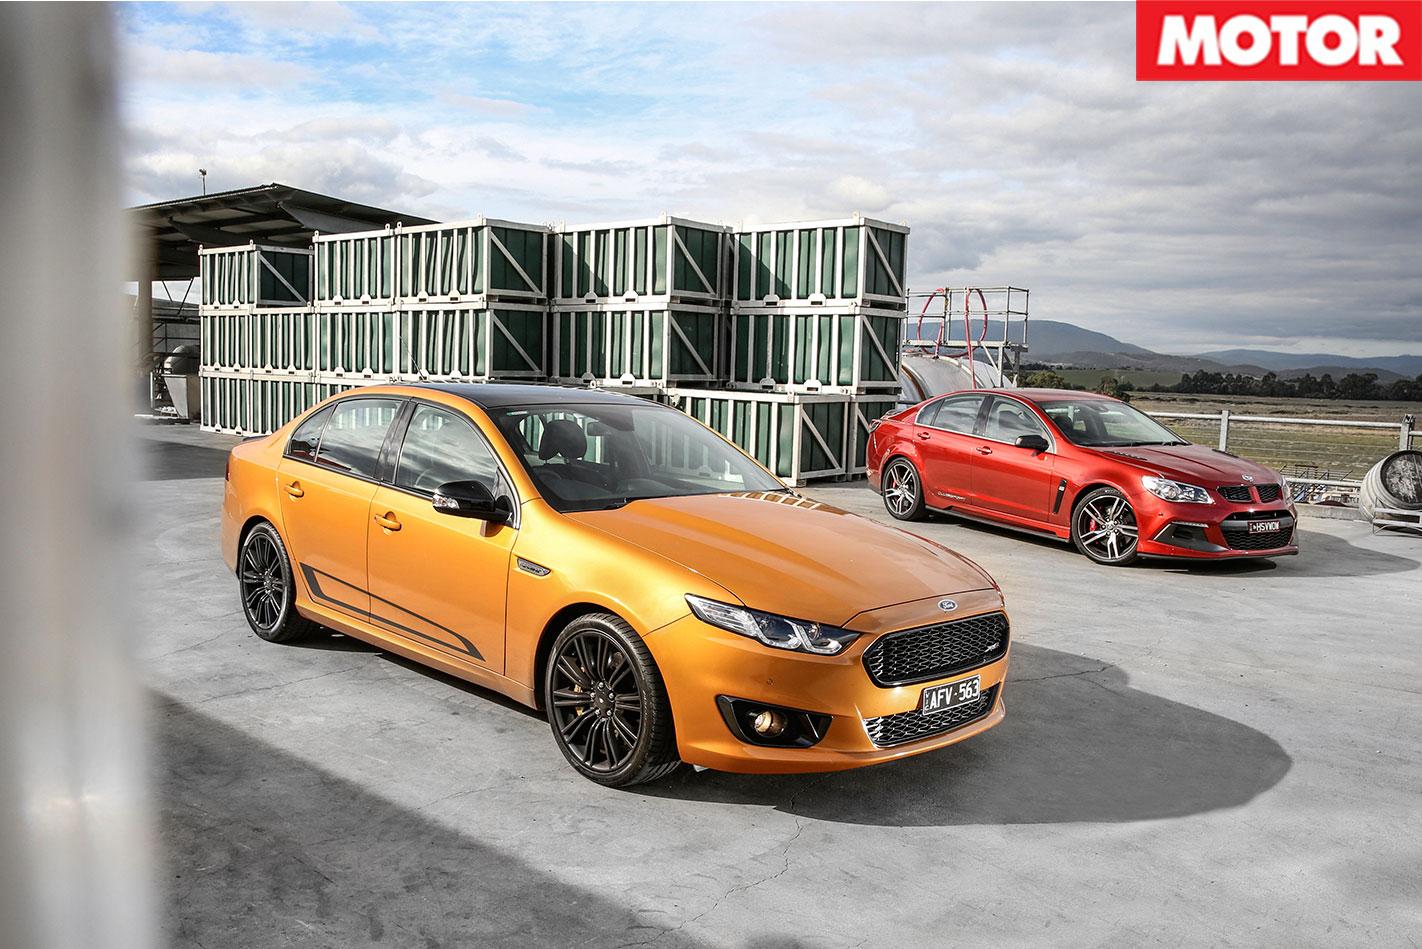 Hsv -Clubsport -LSA-vs -Ford -Falcon -XR8-Sprint